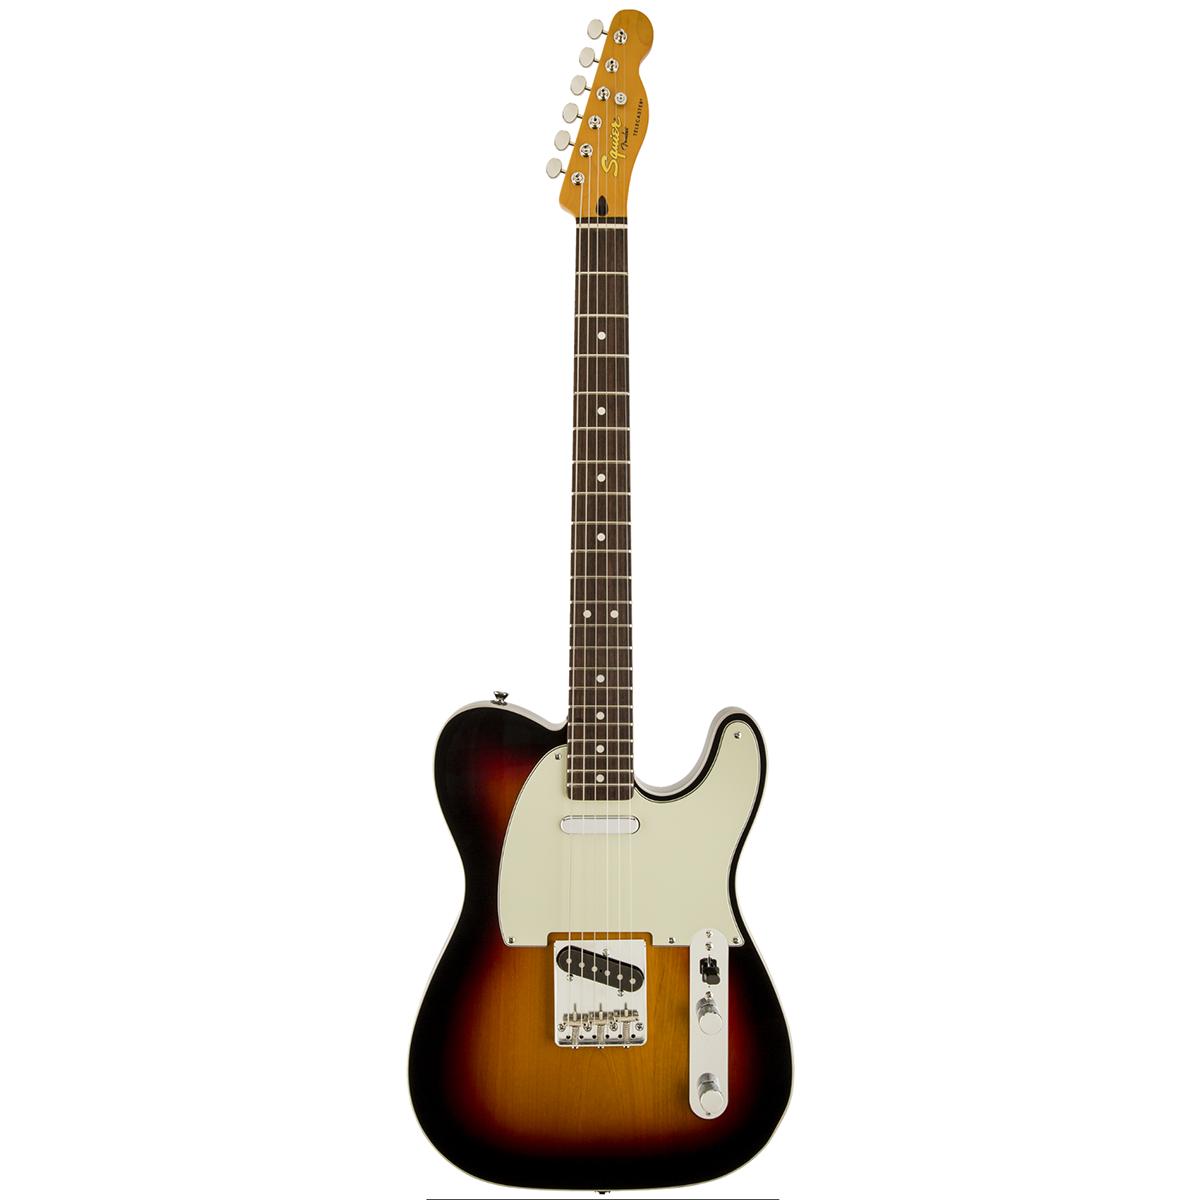 Billede af FenderSquier ClassicVibeTelecasterCustom,RW,3TS el-guitar 3-tonesunburst